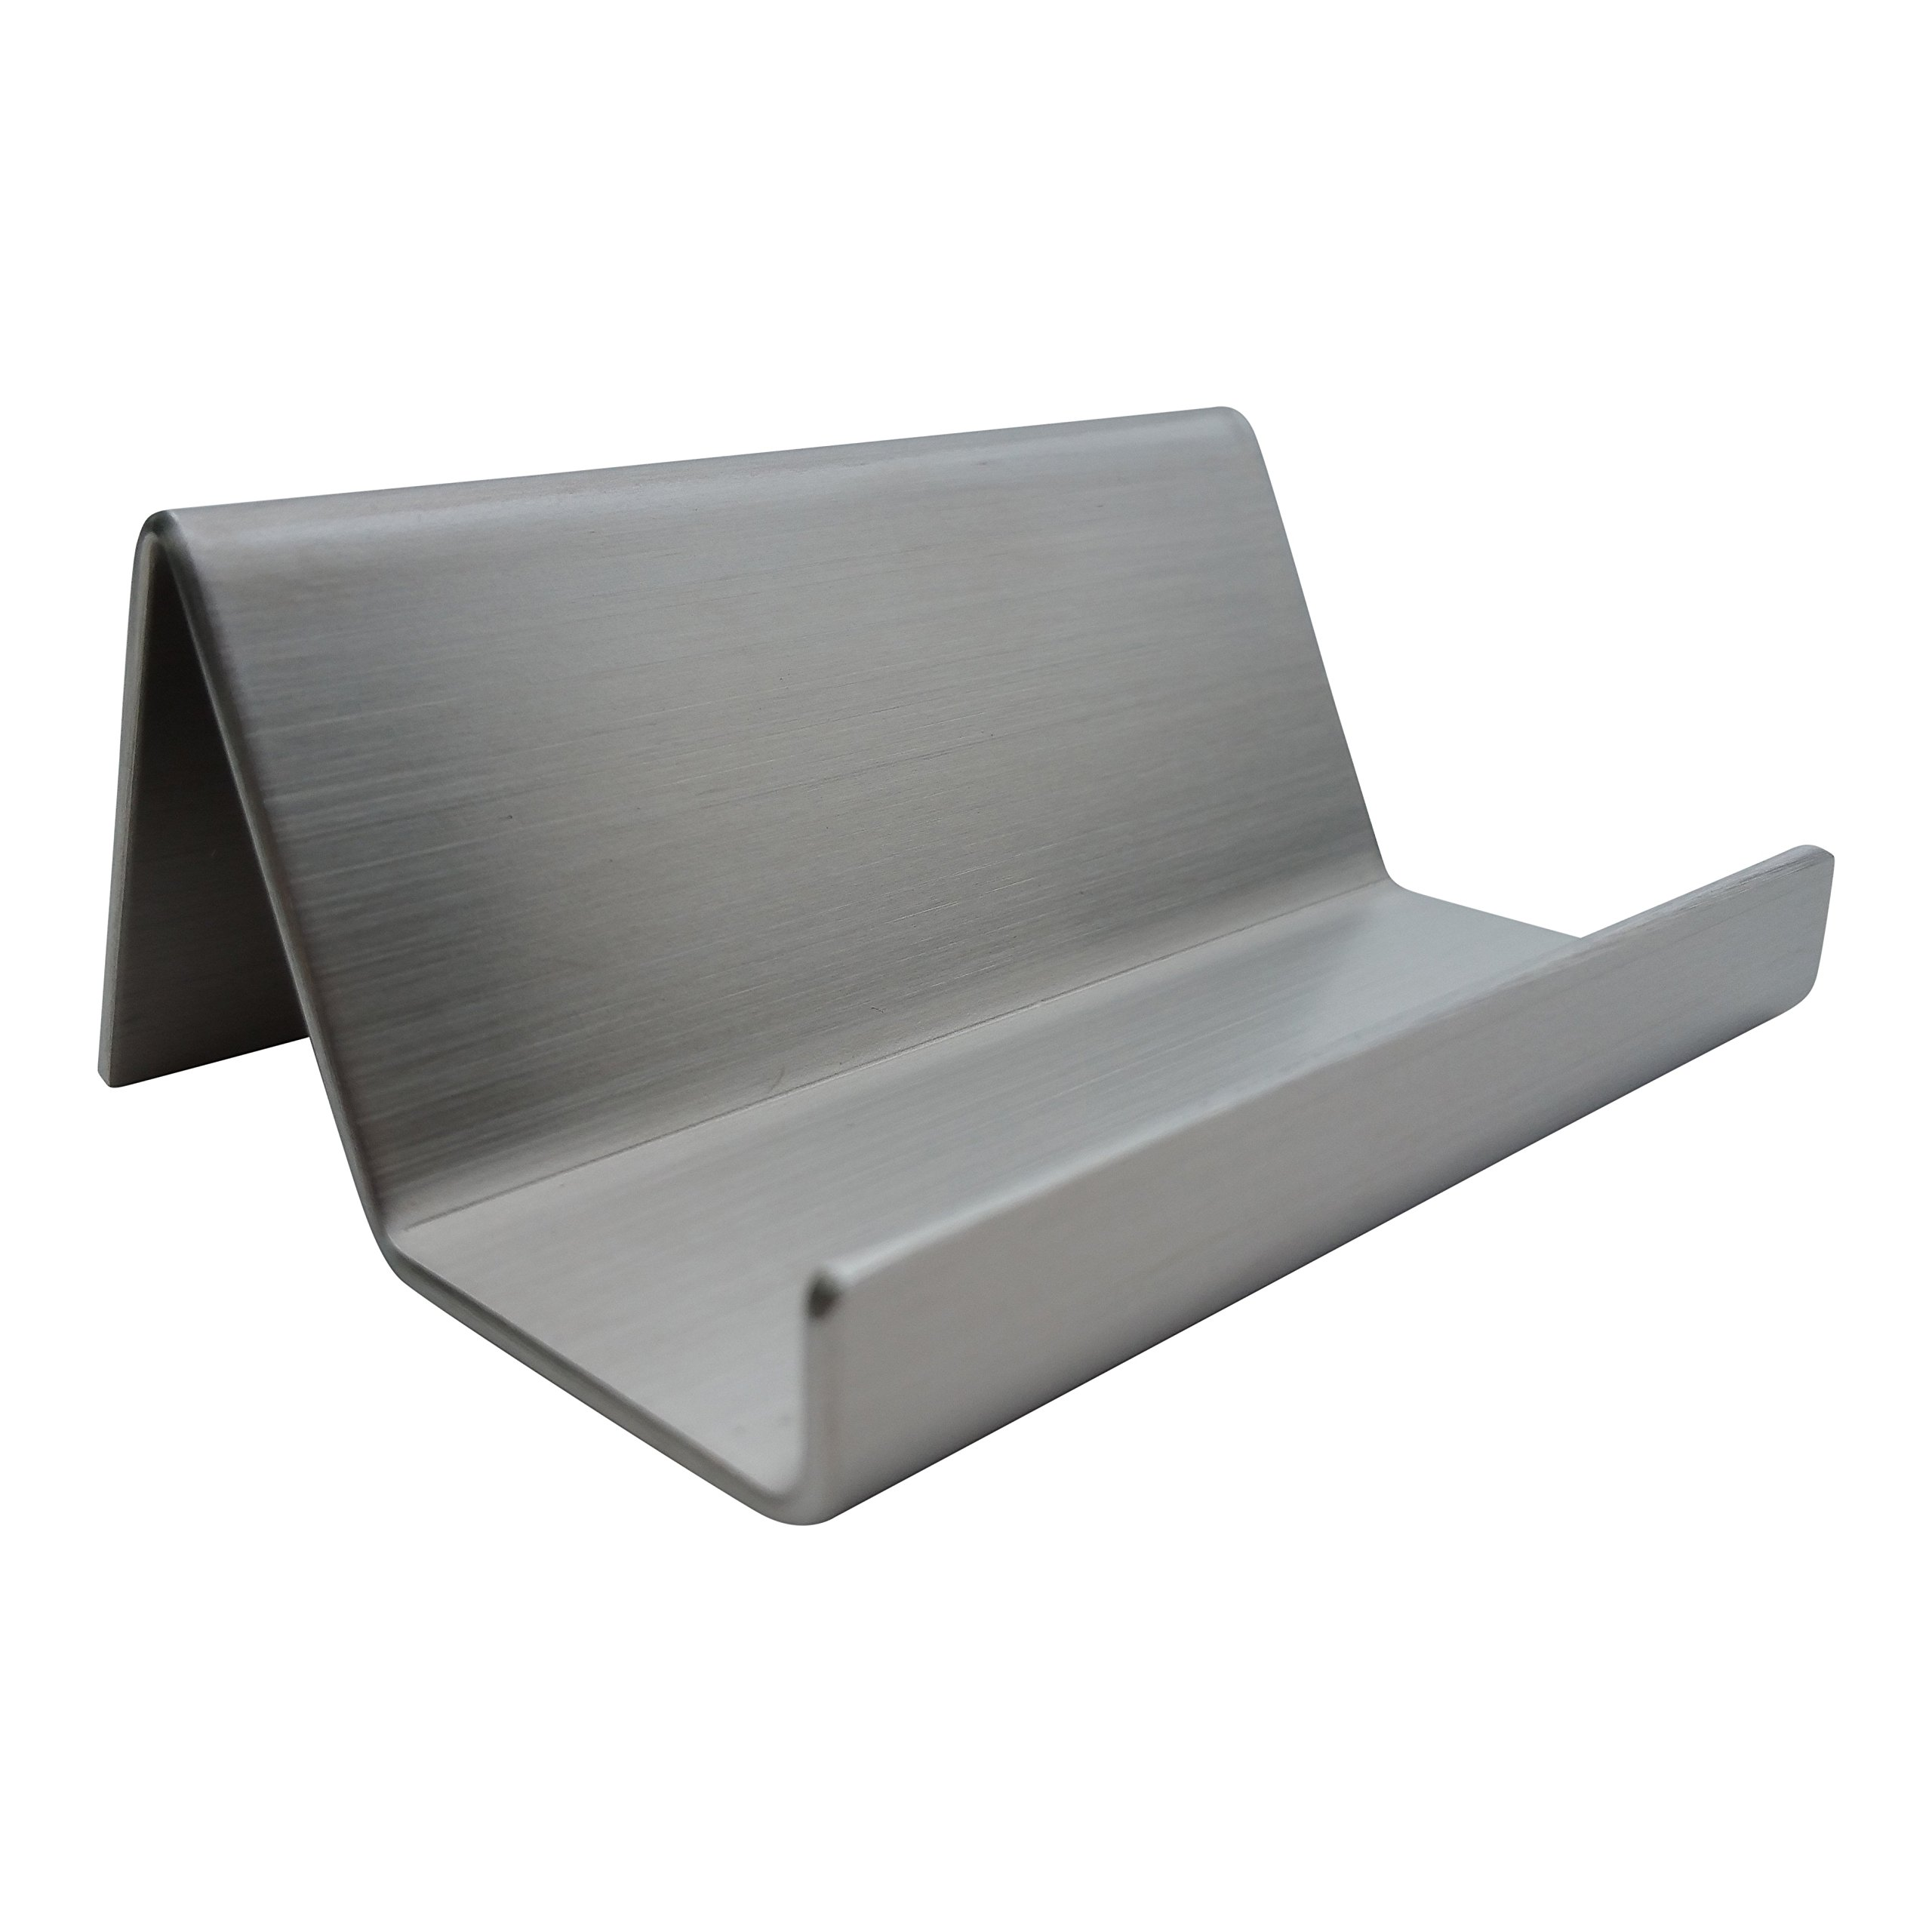 81sytft1iglg business card holder desk display with brushed stainless steel finish by pensoek magicingreecefo Choice Image